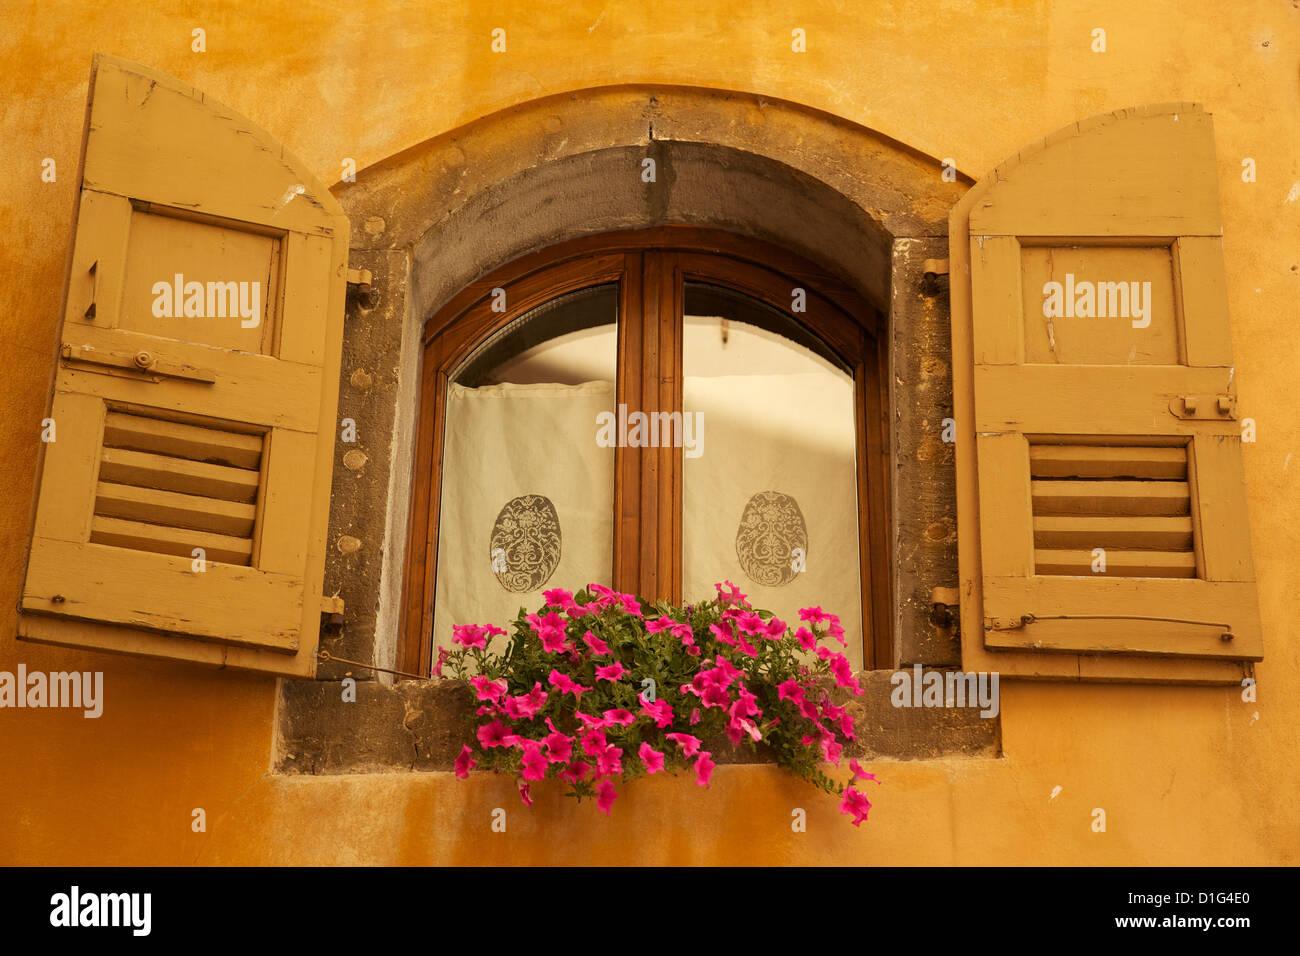 Shuttered window and flowers, Piazza Mercato, Belluno, Province of Belluno, Veneto, Italy, Europe - Stock Image